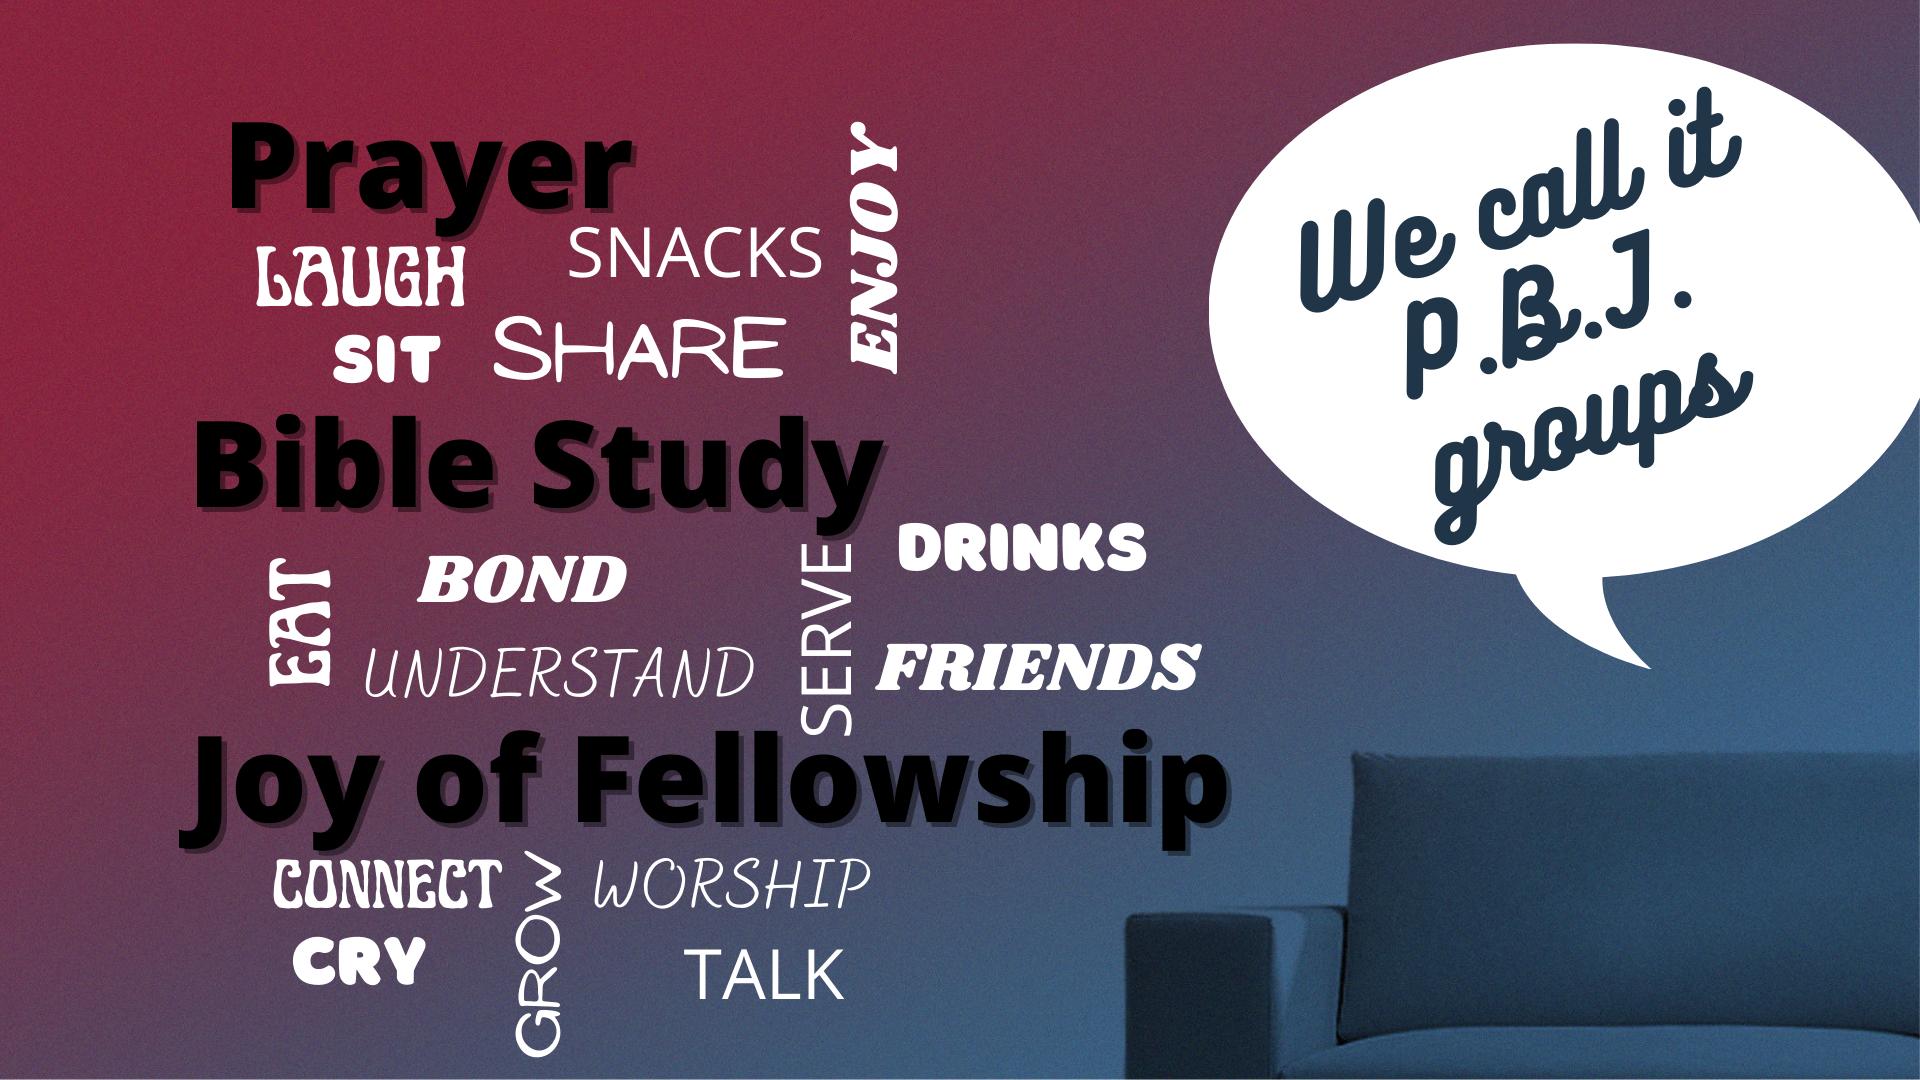 P. B. J. Home Groups